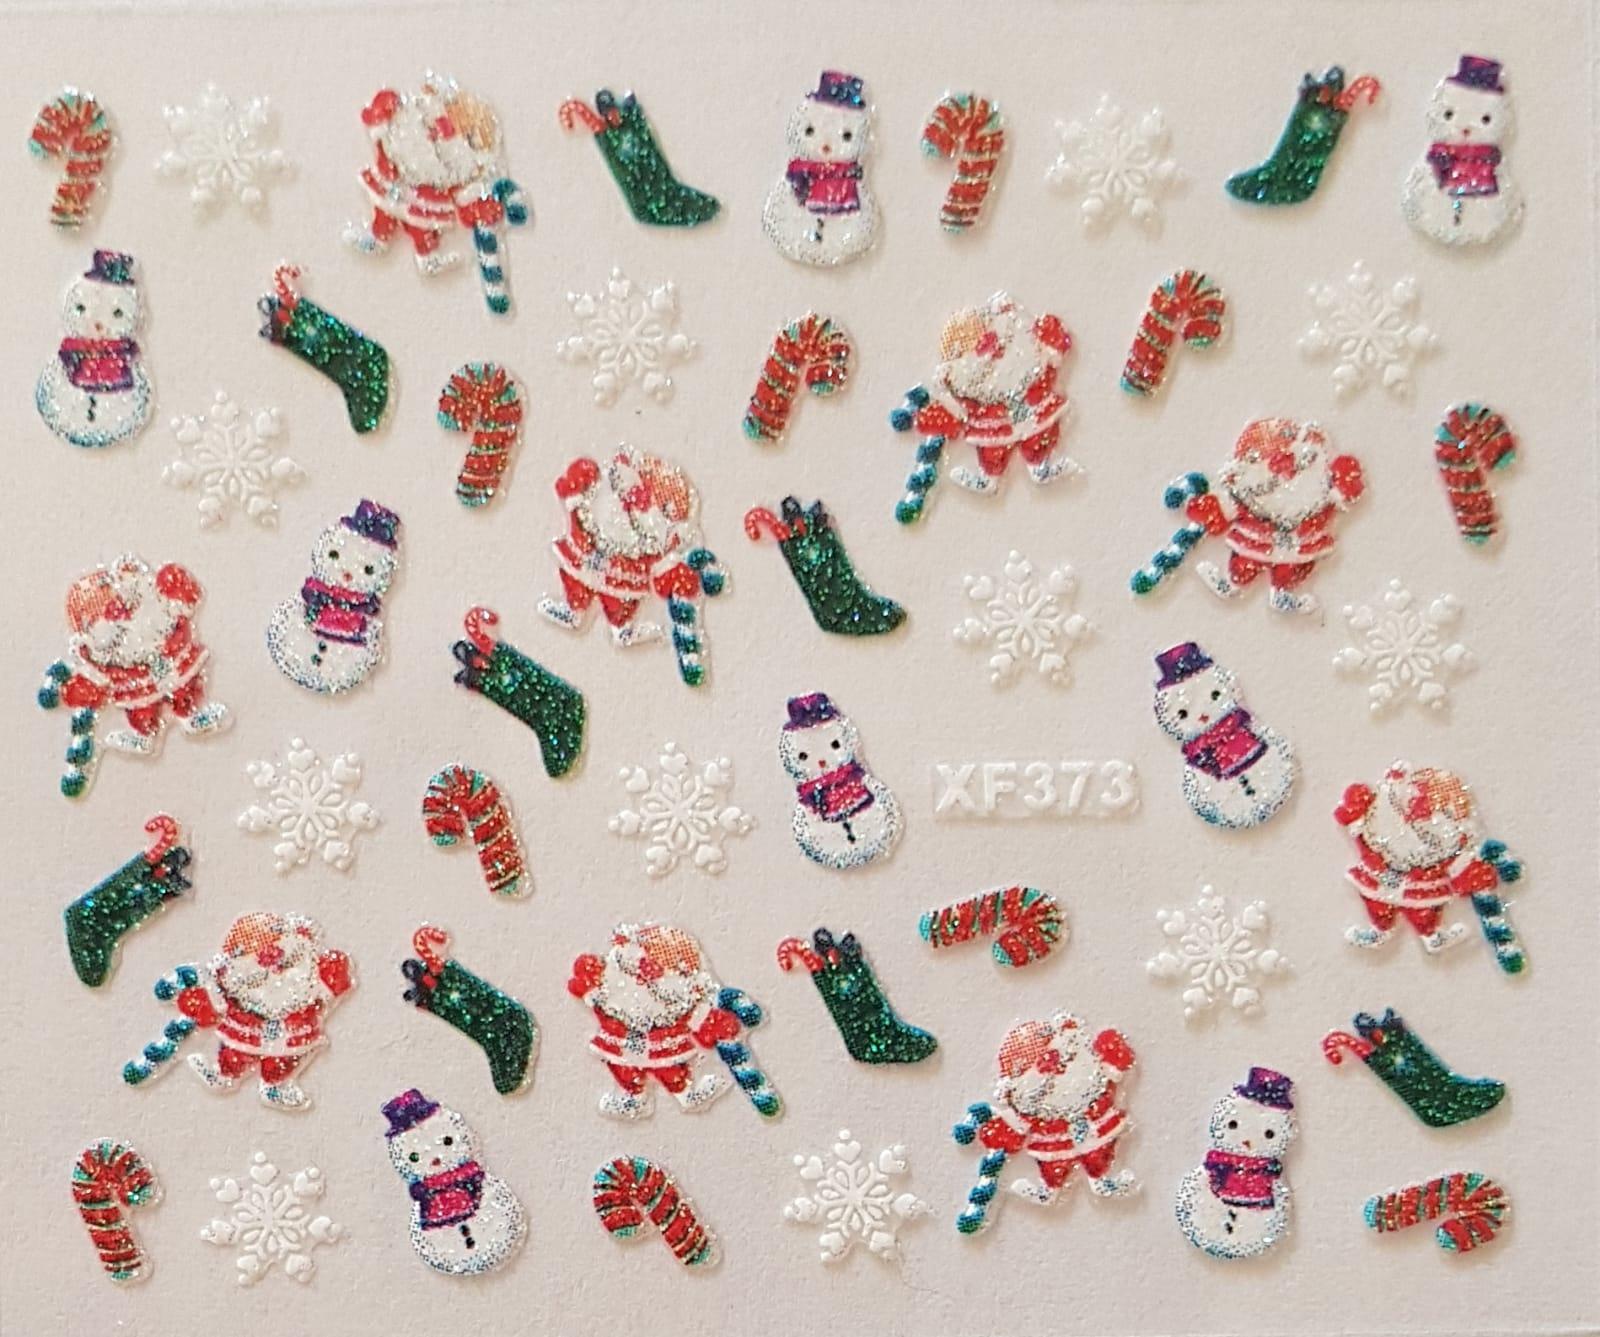 Stickers navideños xf-373